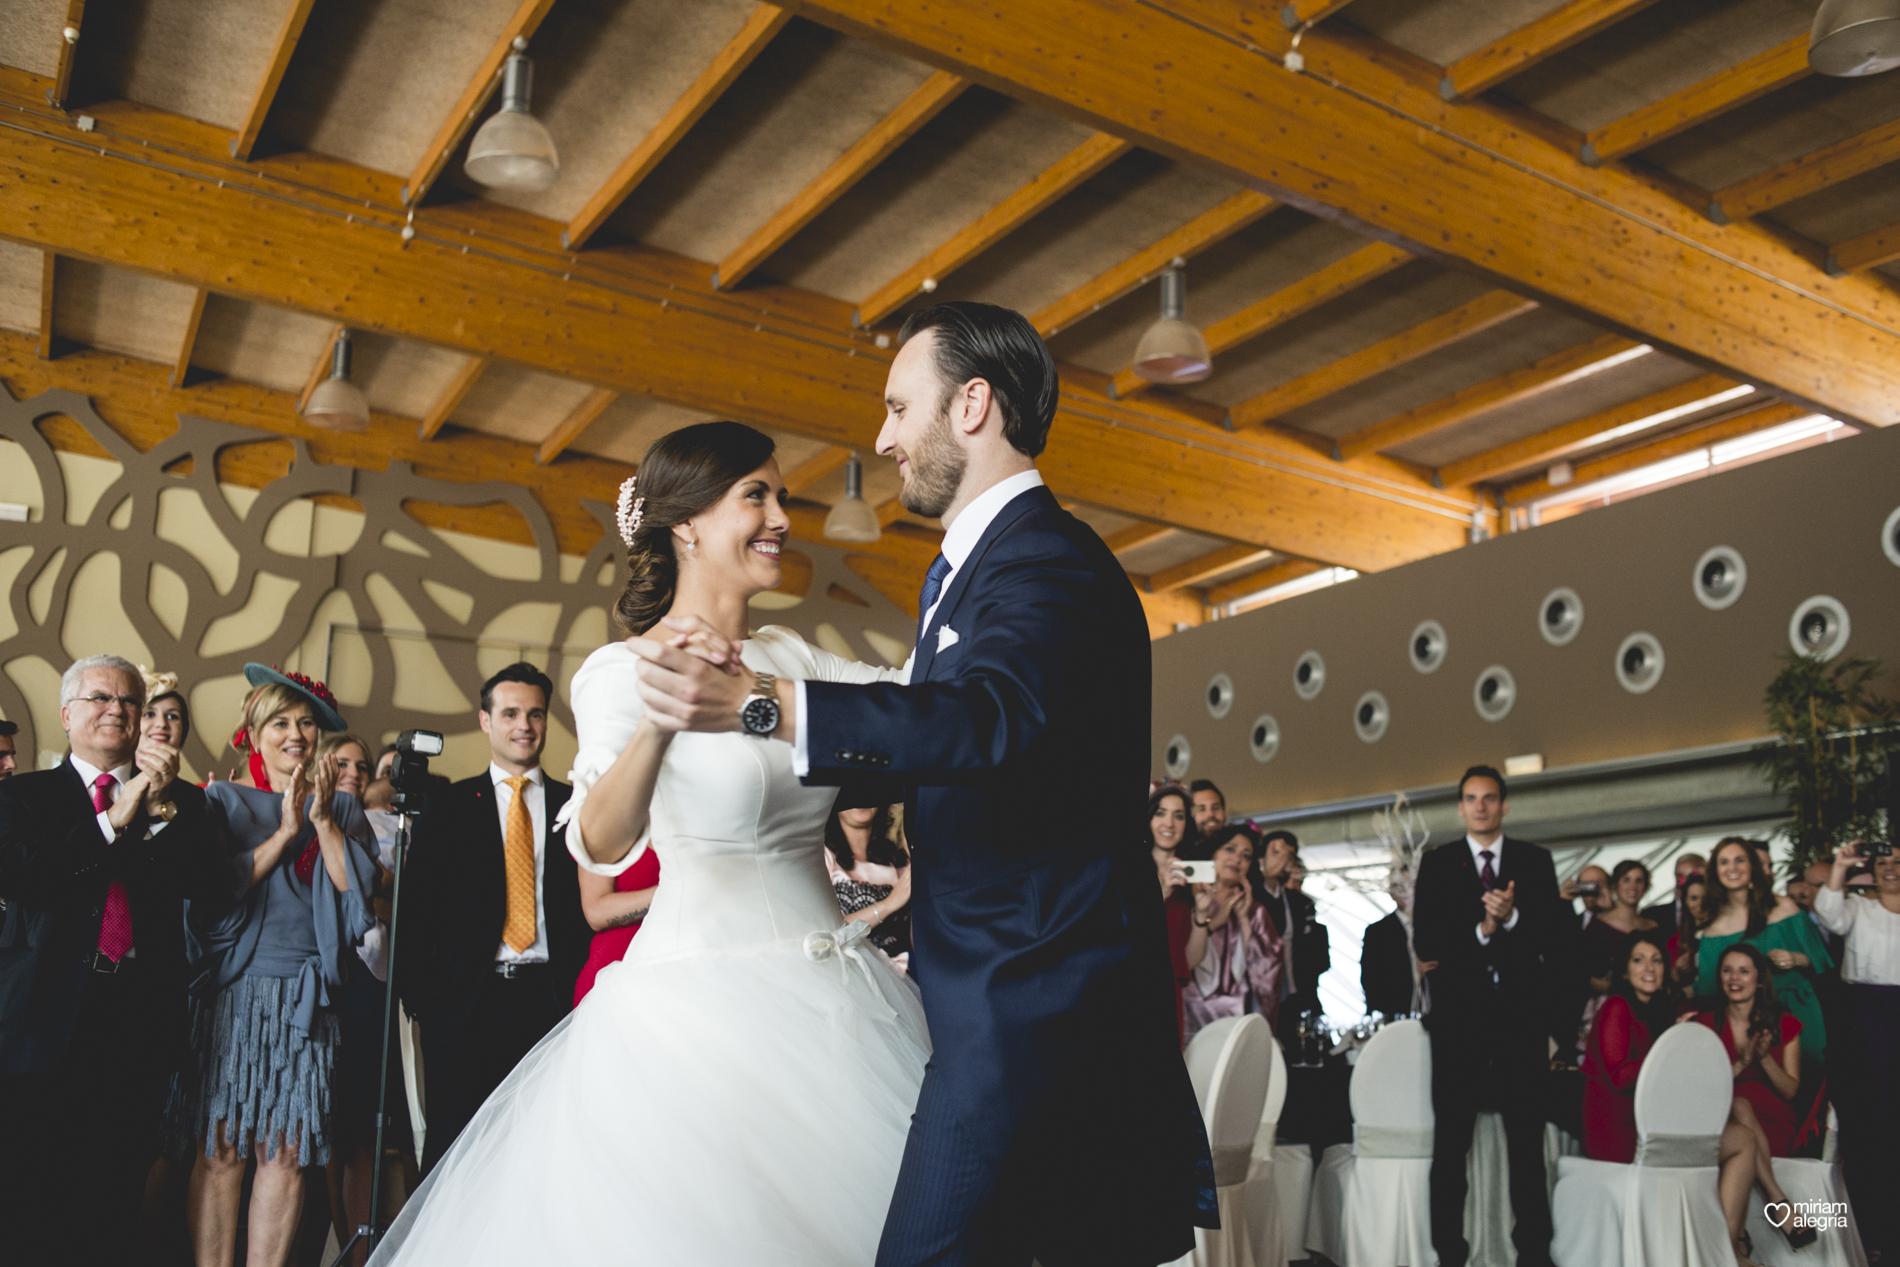 boda-en-la-catedral-de-murcia-miriam-alegria-fotografos-boda-murcia-73